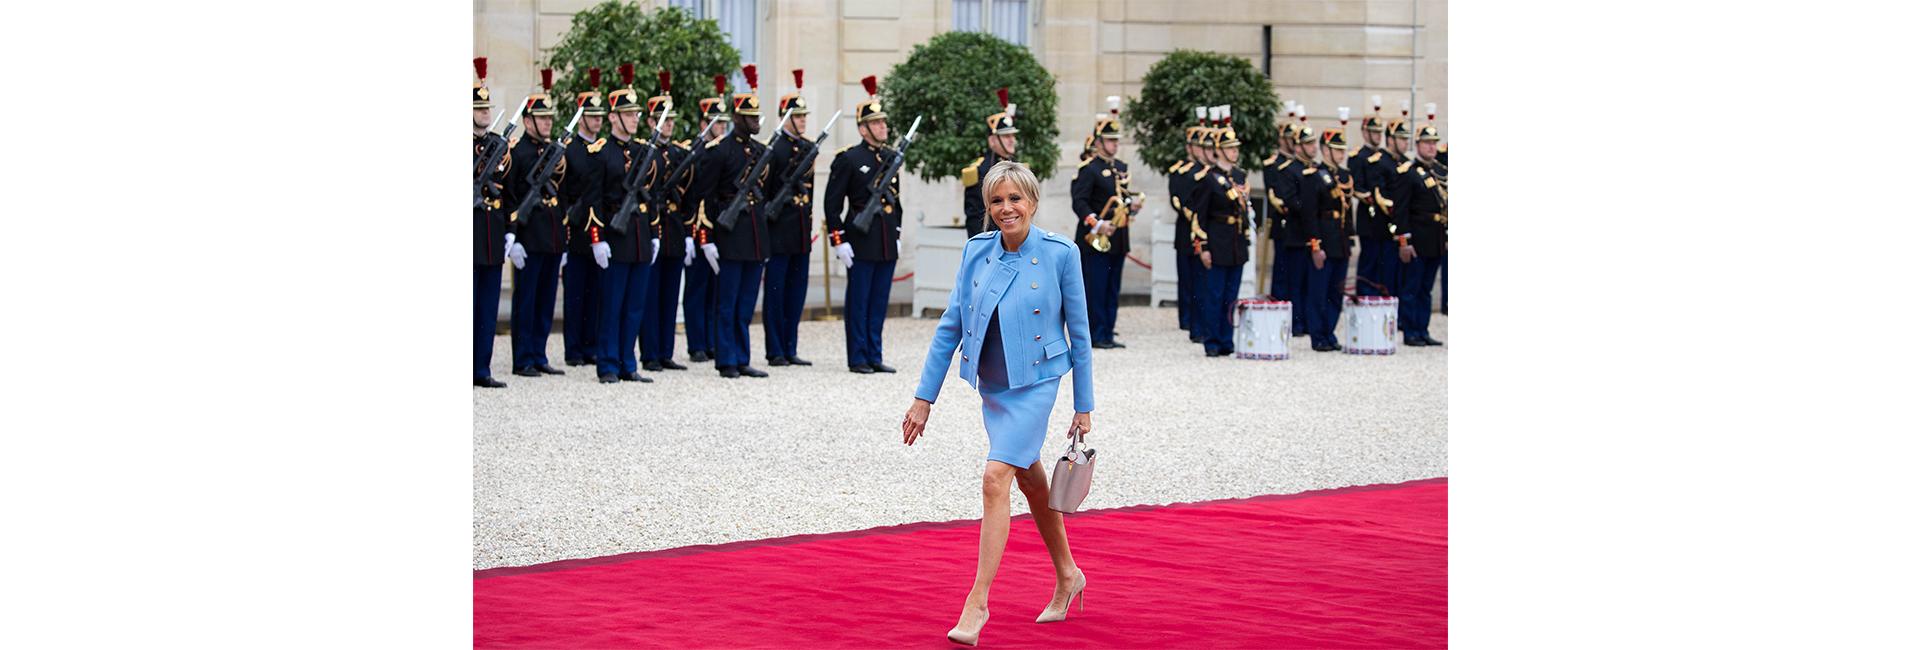 Кто такая Брижит Макрон — супруга нового президента Франции (фото 3)